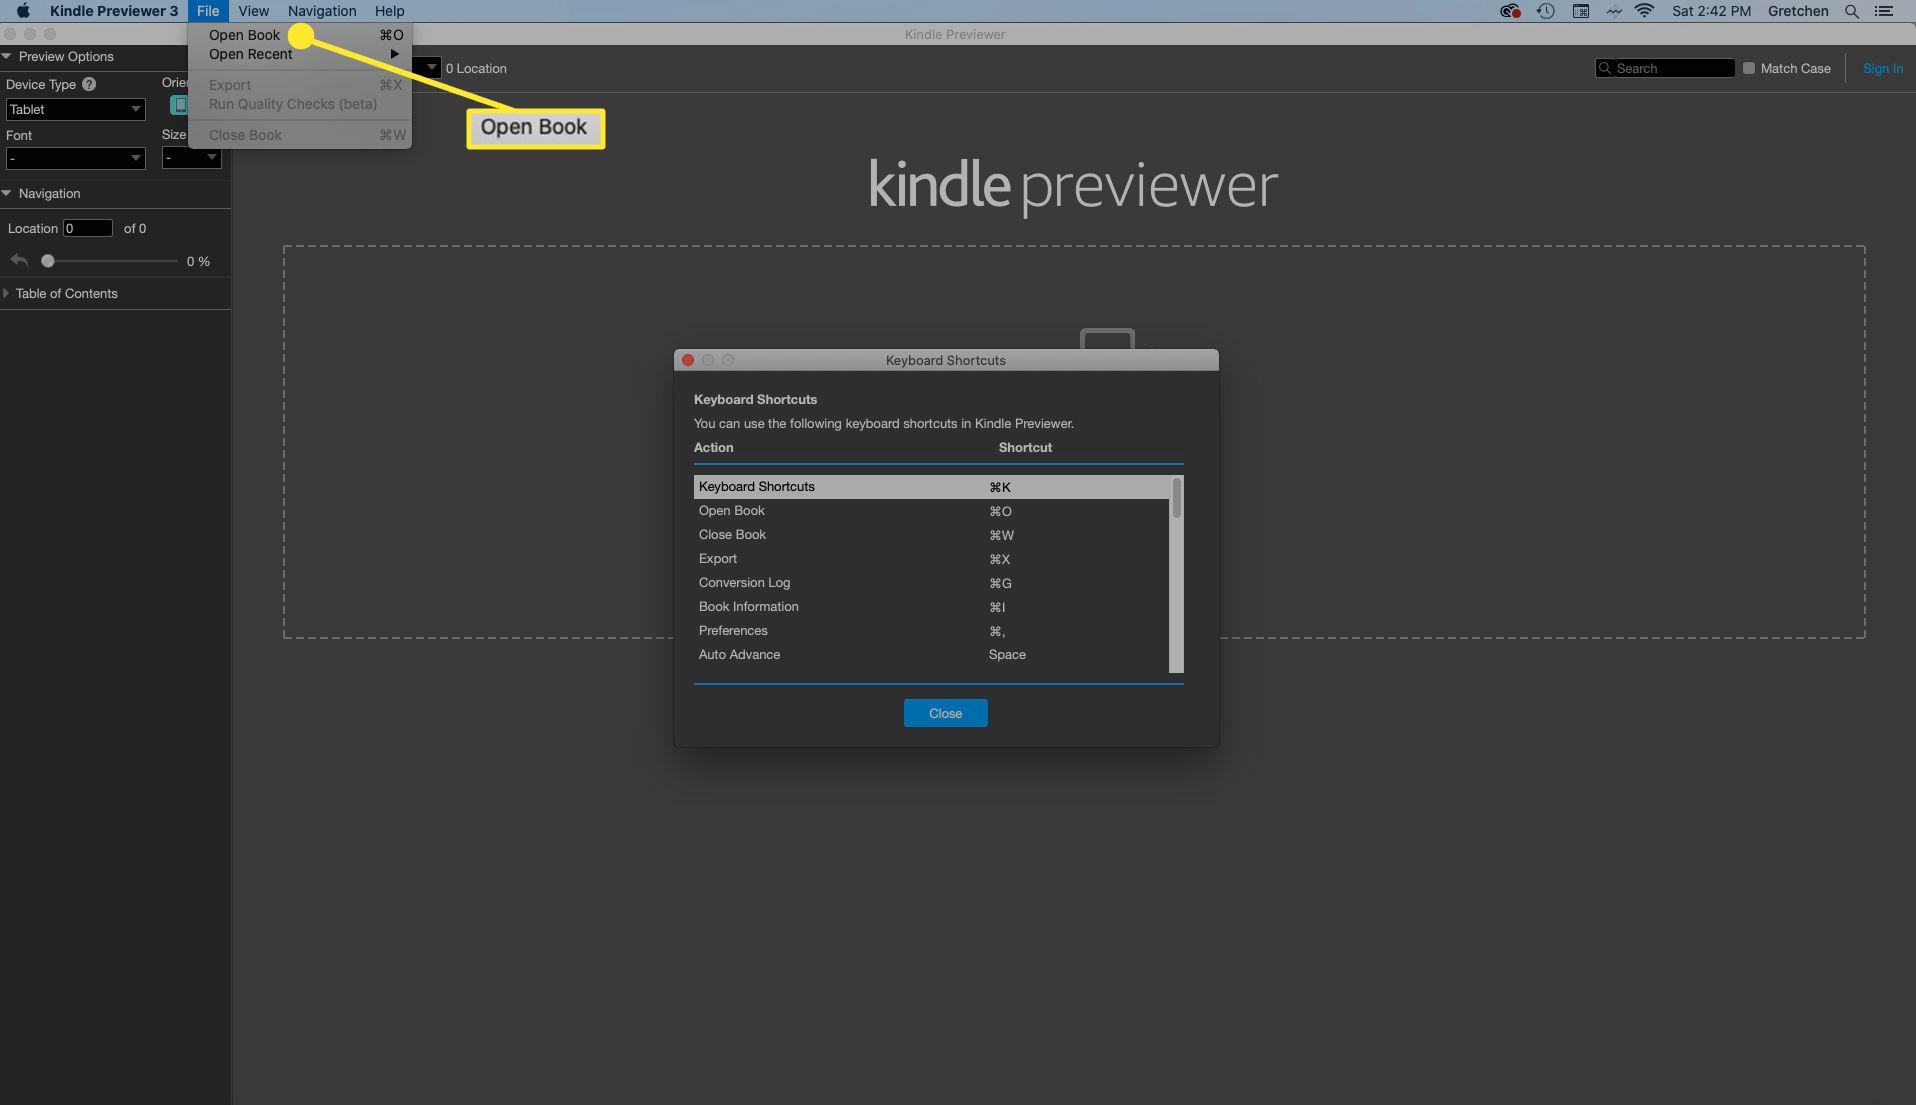 Select File > Open Book to open the Open Book dialog box.